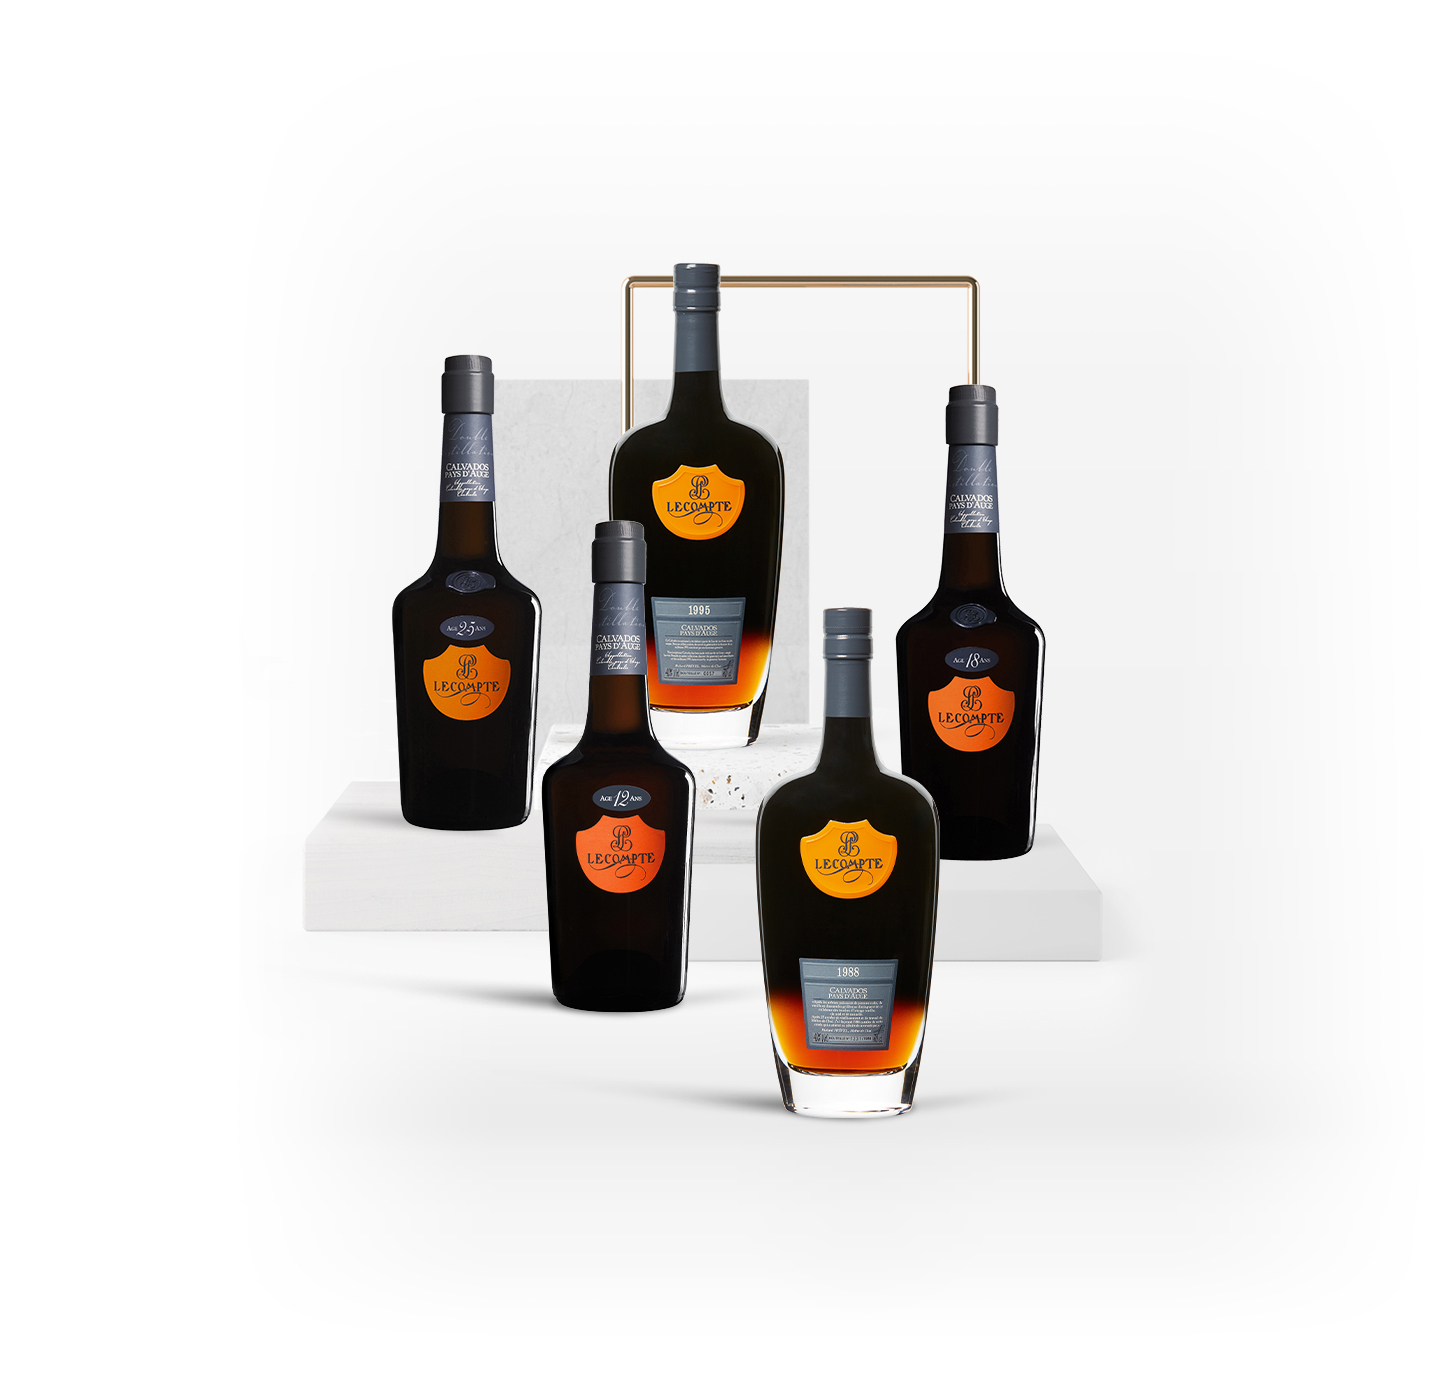 Collection Lecompte Calvados Pays Auge Rare